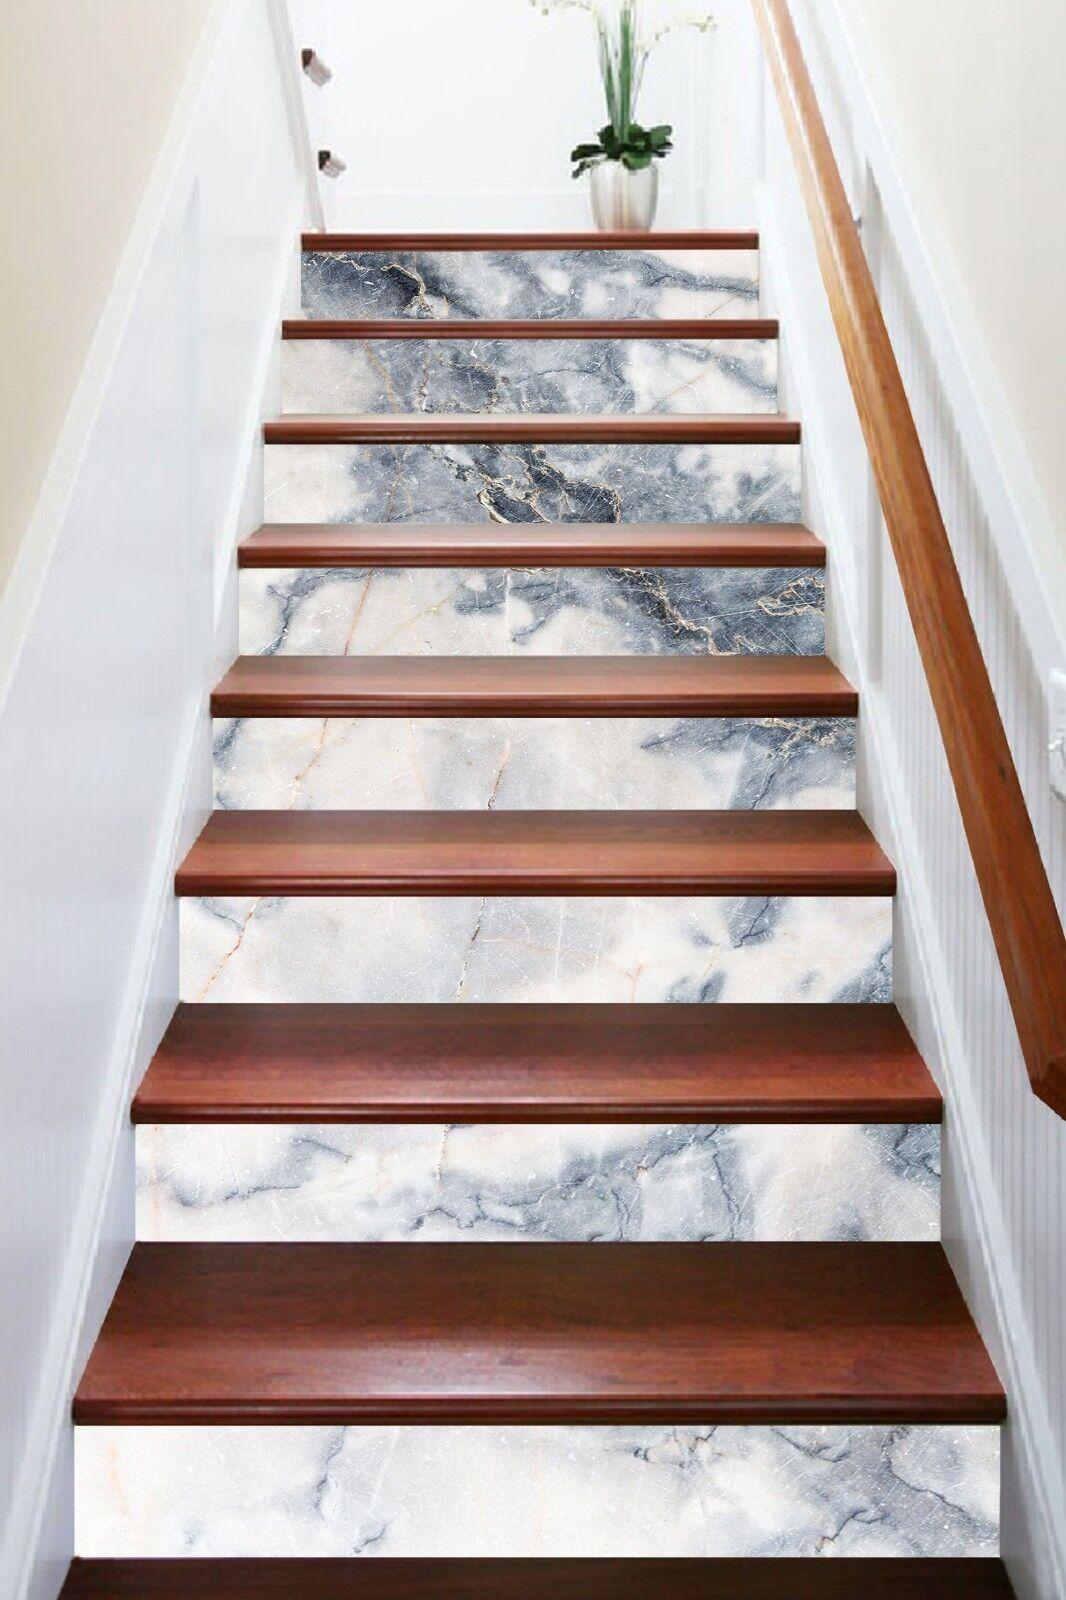 3D Grey White Texture 1 Tile Marble Stair Riser Decoration Mural Vinyl Wallpaper